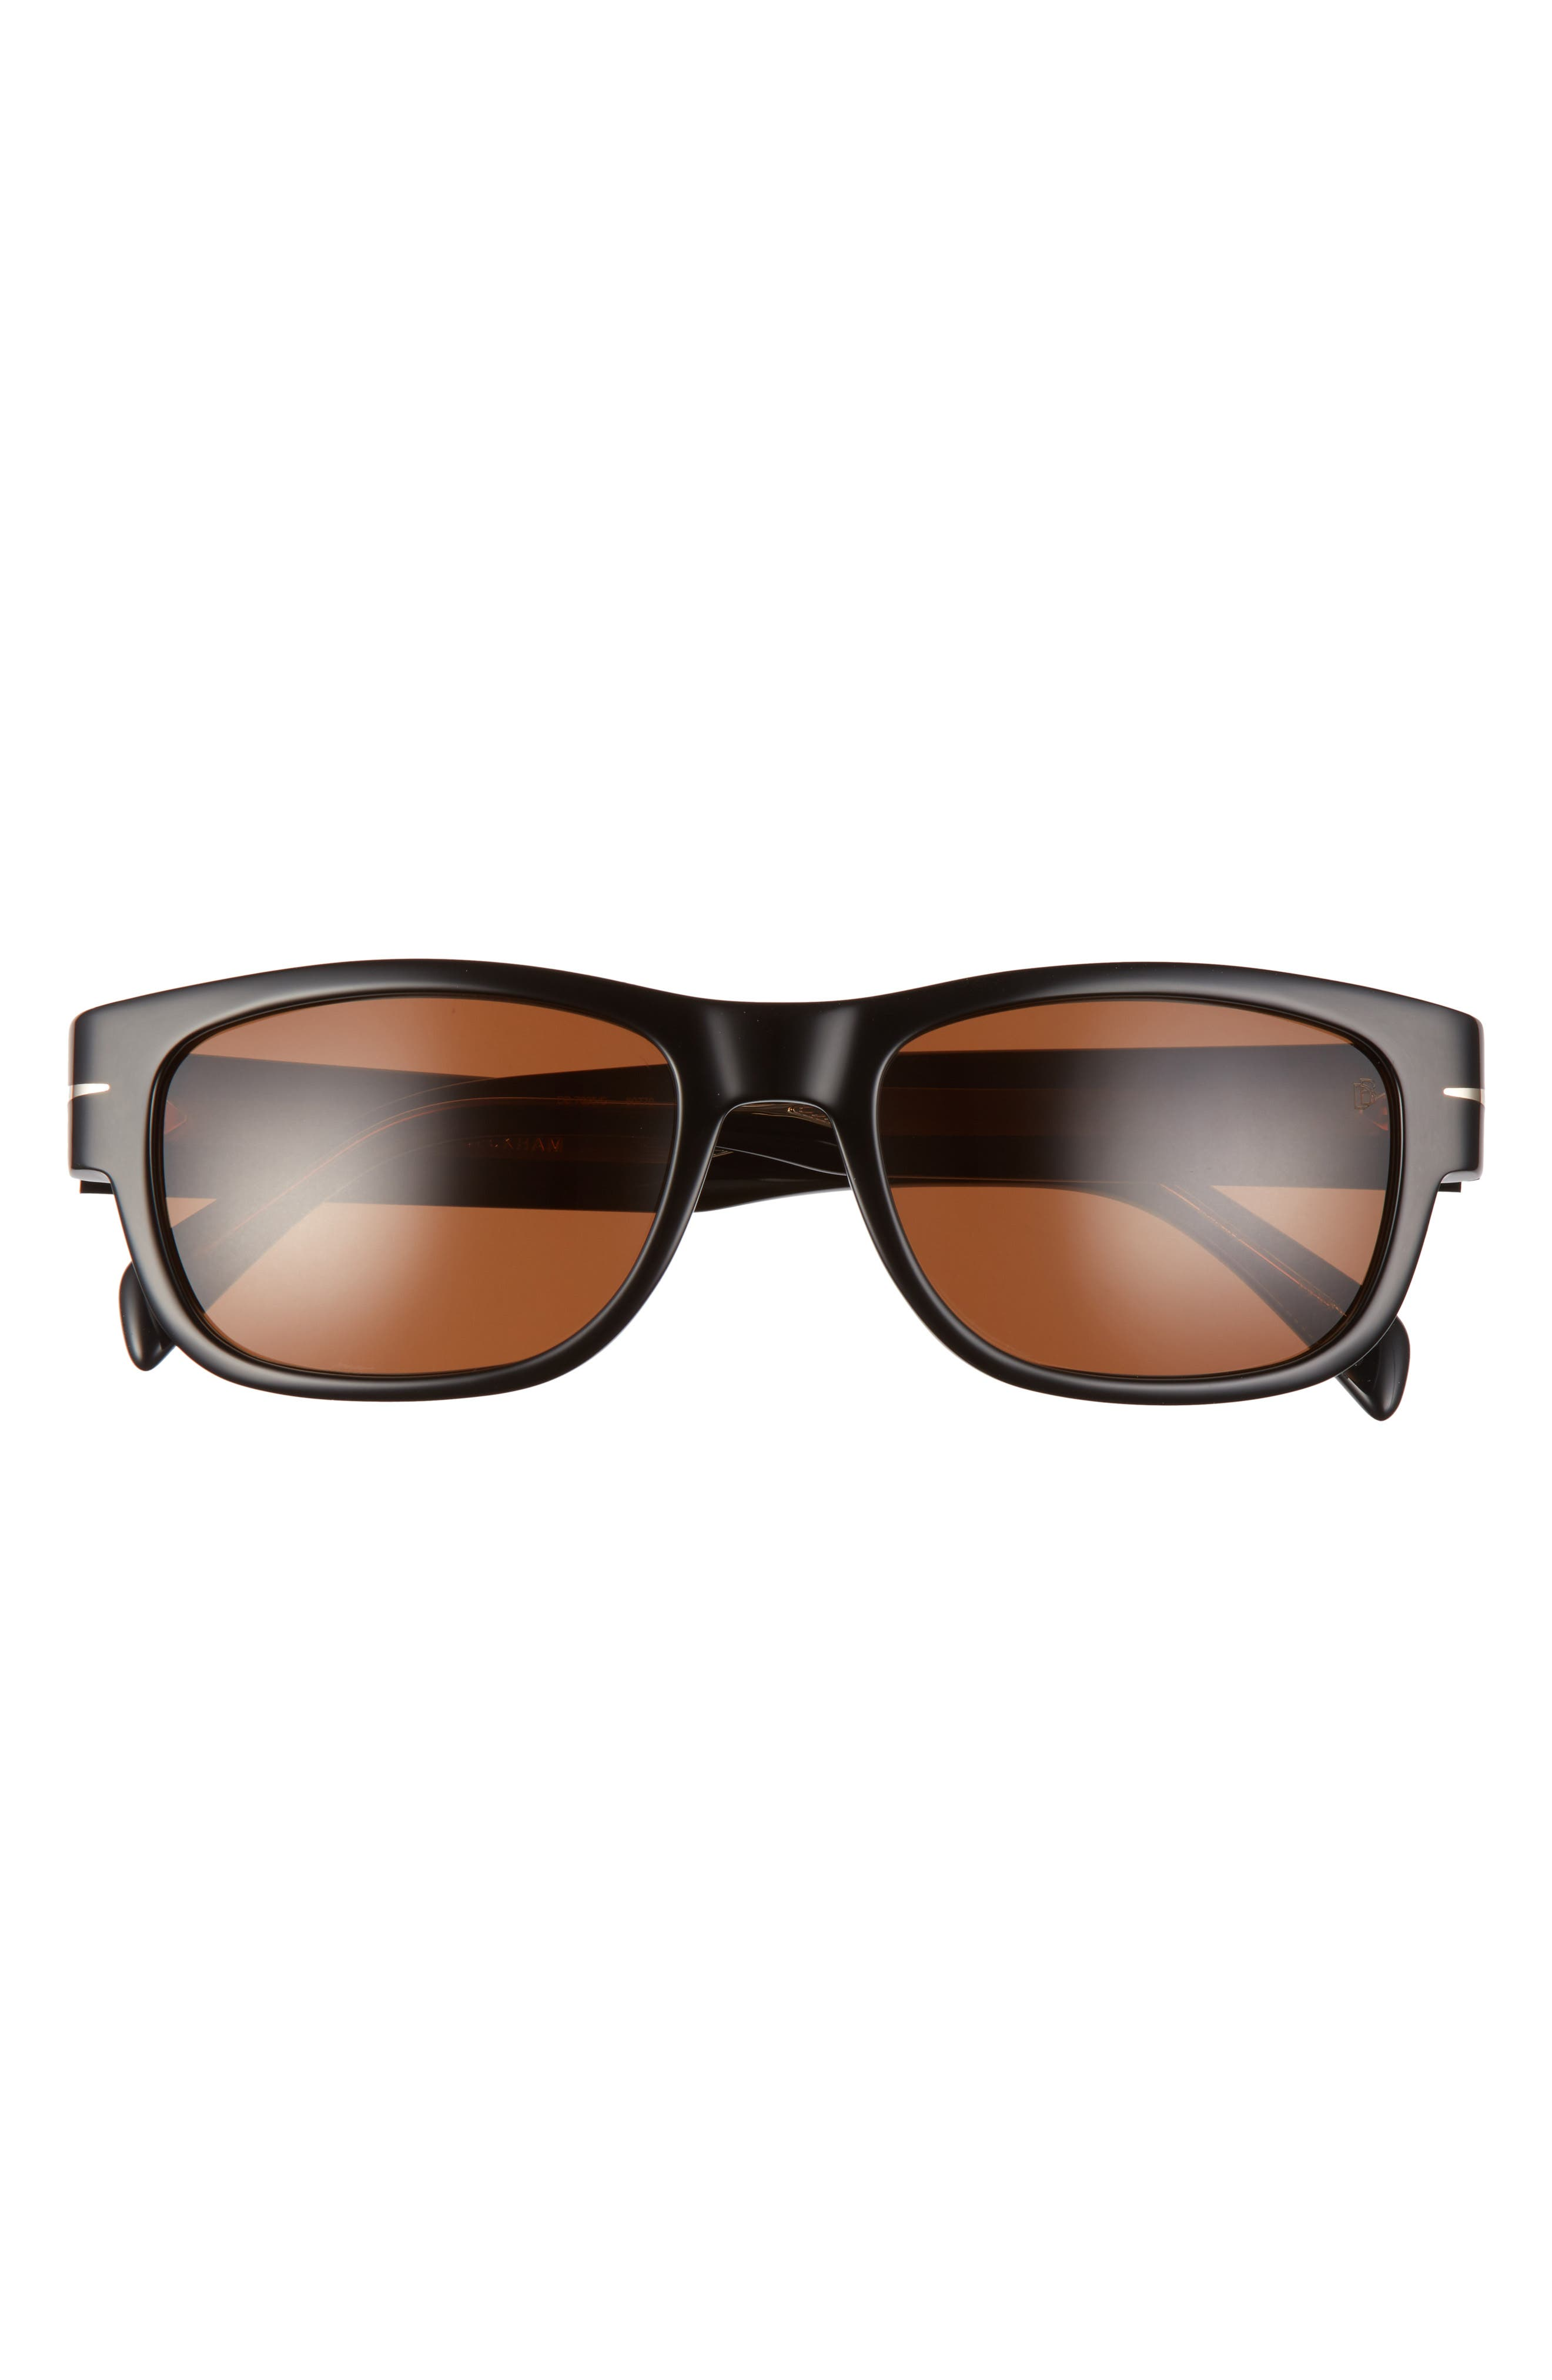 Men's Eyewear By David Beckham 56mm Rectangular Sunglasses